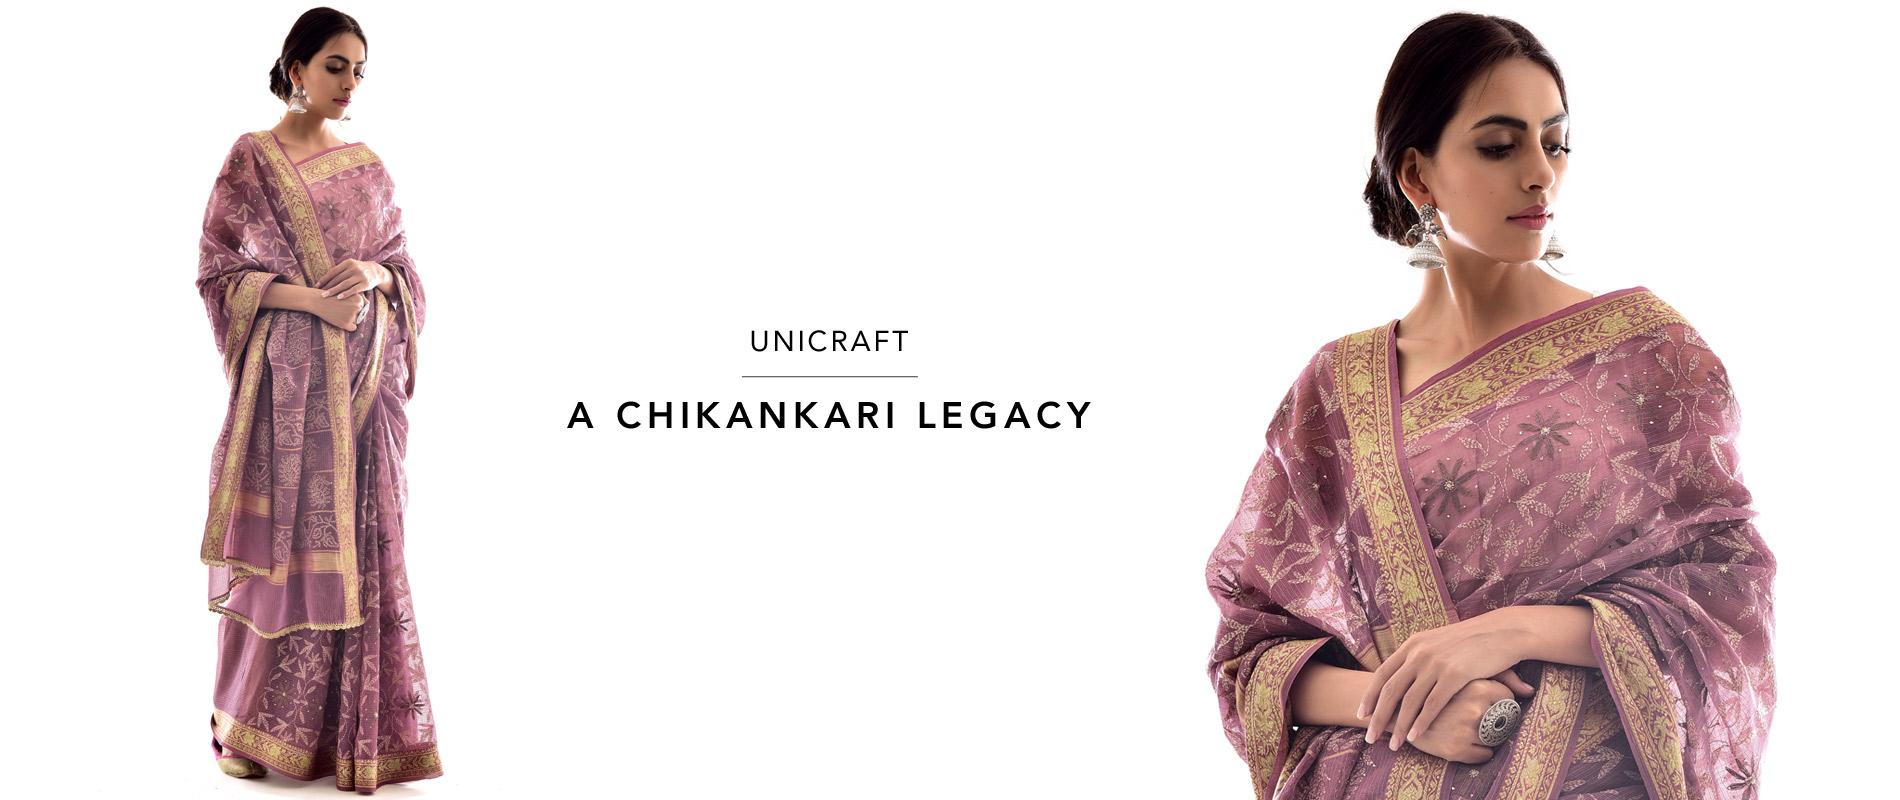 170411UNI049_Unicraft_Chikankari_Sarees_6261